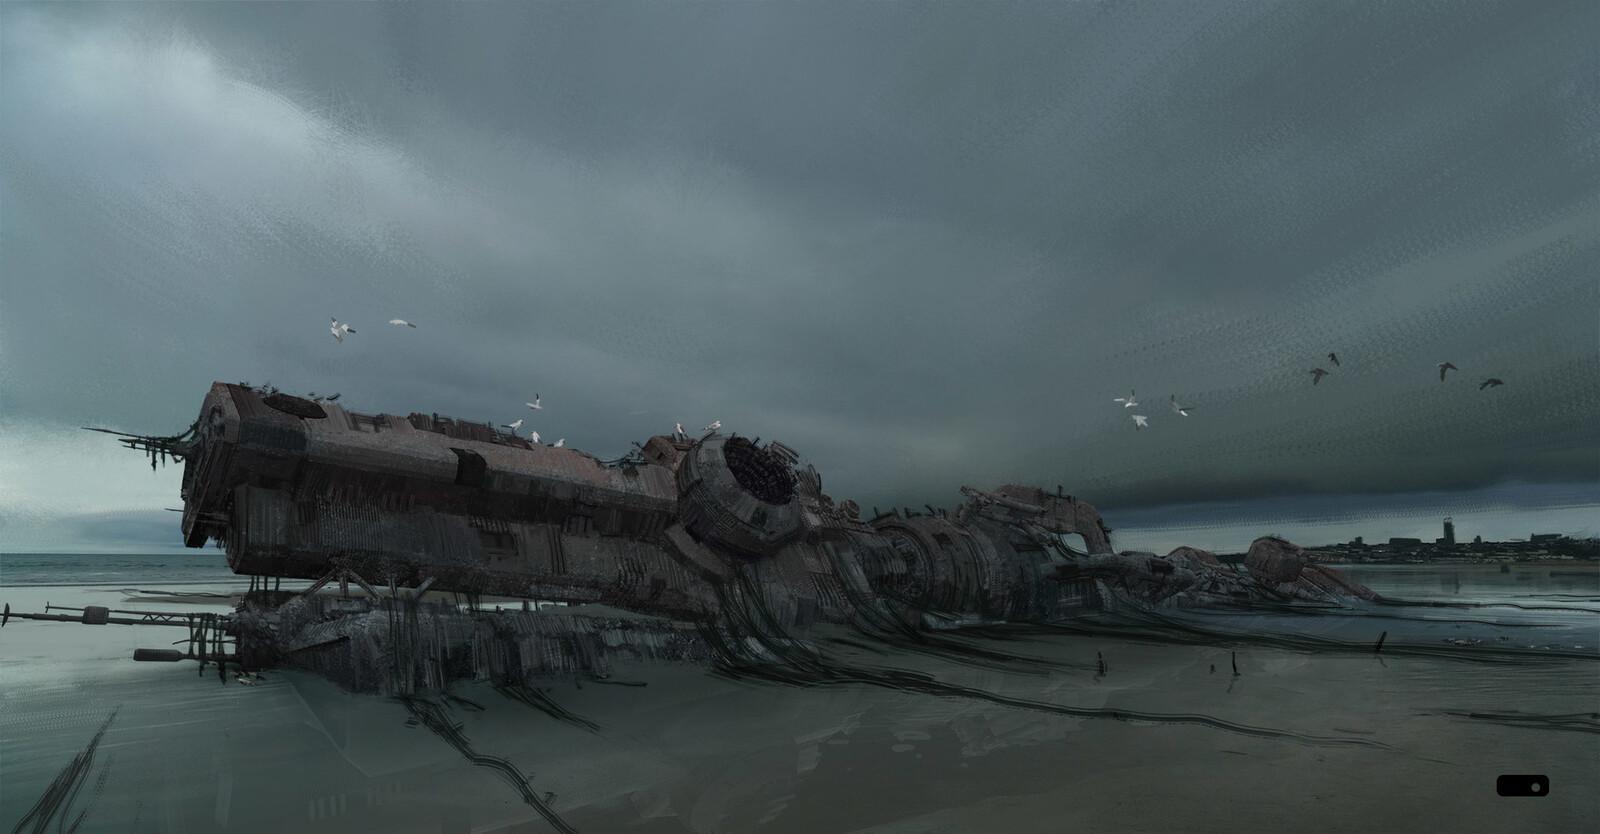 Overcast beach abandoned ship